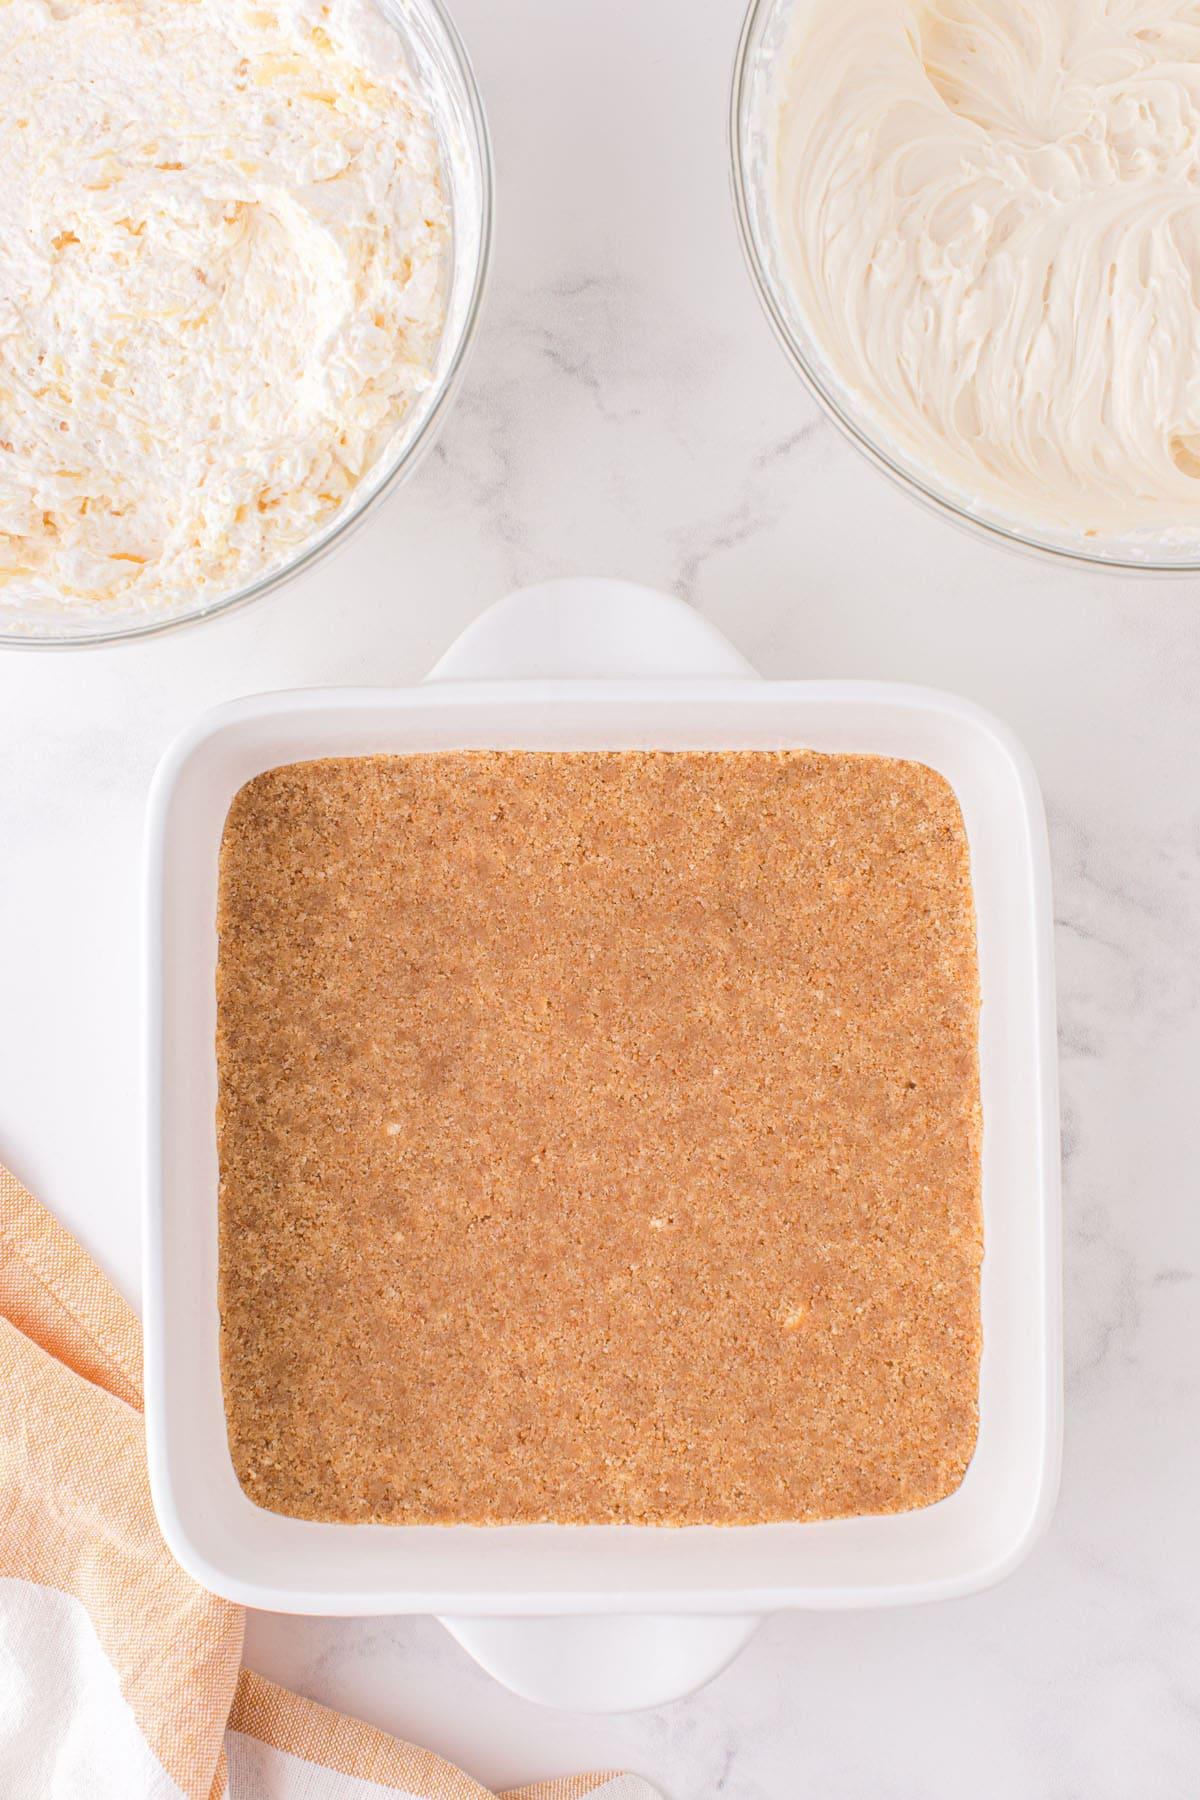 press mixture at the bottom of your baking pan